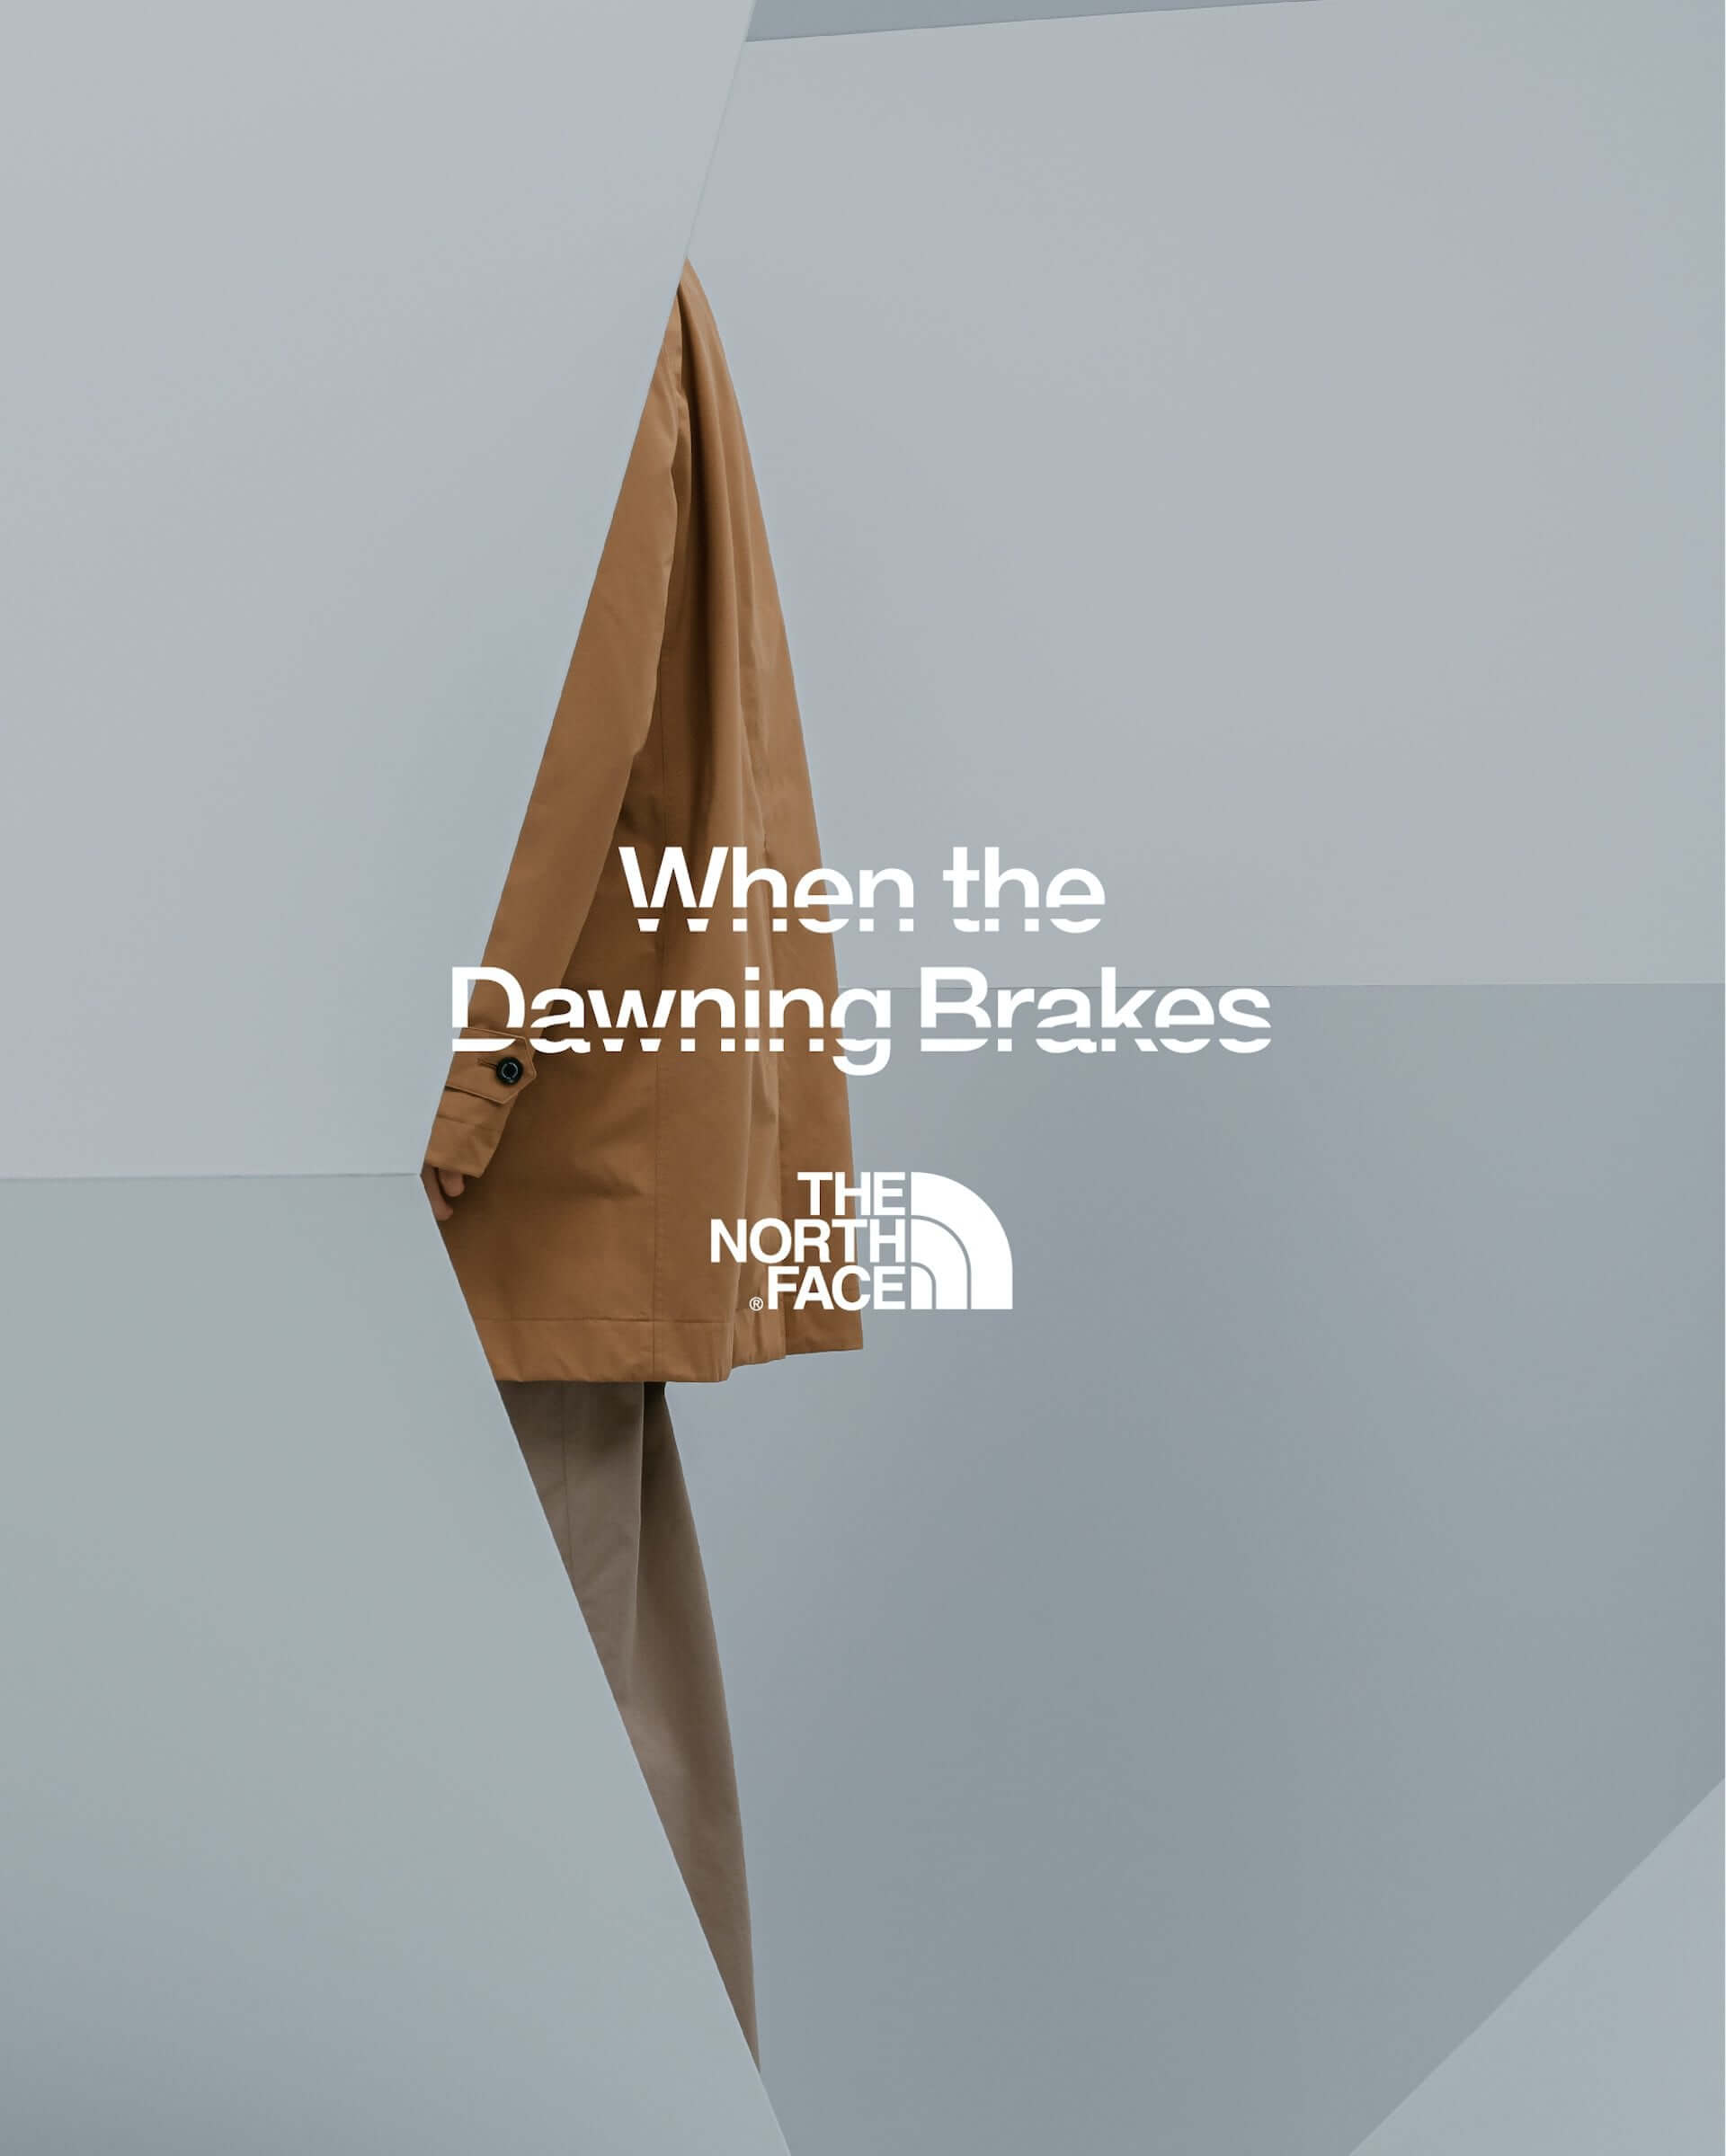 THE NORTH FACE日本橋店の2周年記念に別注コレクション「When the Dawning Brakes」が登場!「GORE-TEX SHAKEDRY」搭載のジャケットも lf201021_tnf-nihonbashi_15-1920x2399